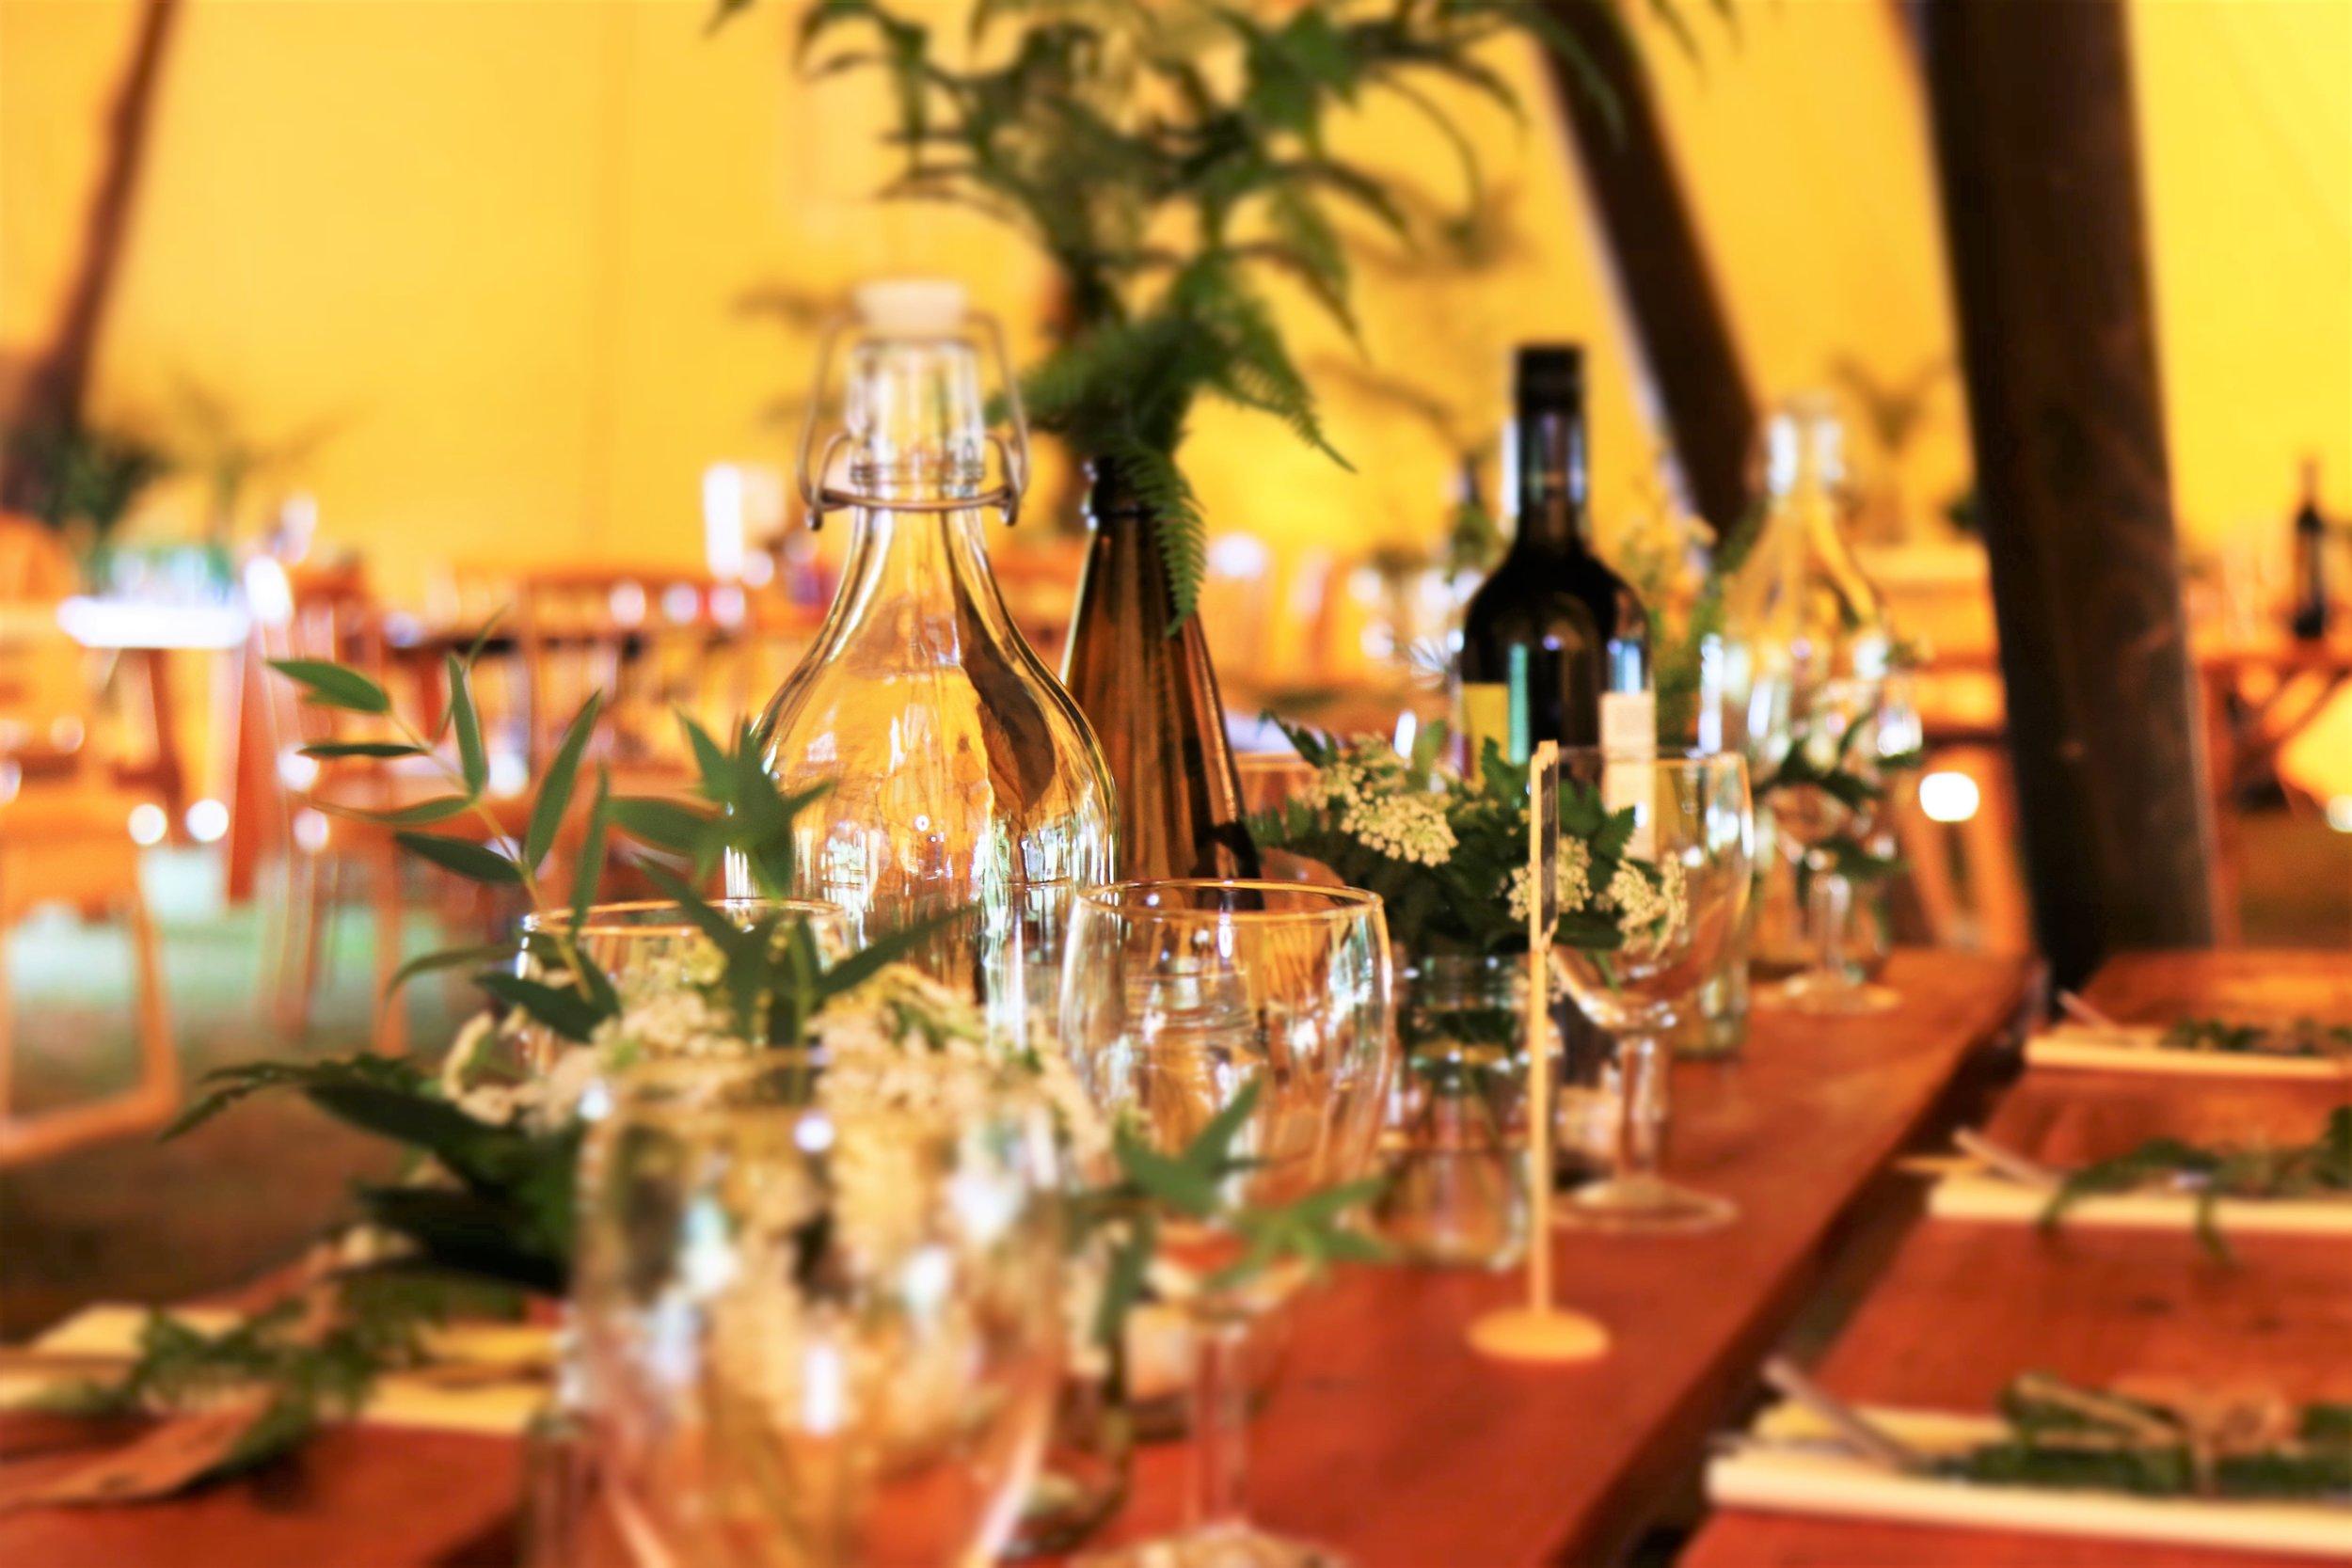 bar-catering-celebration-1243337.jpeg